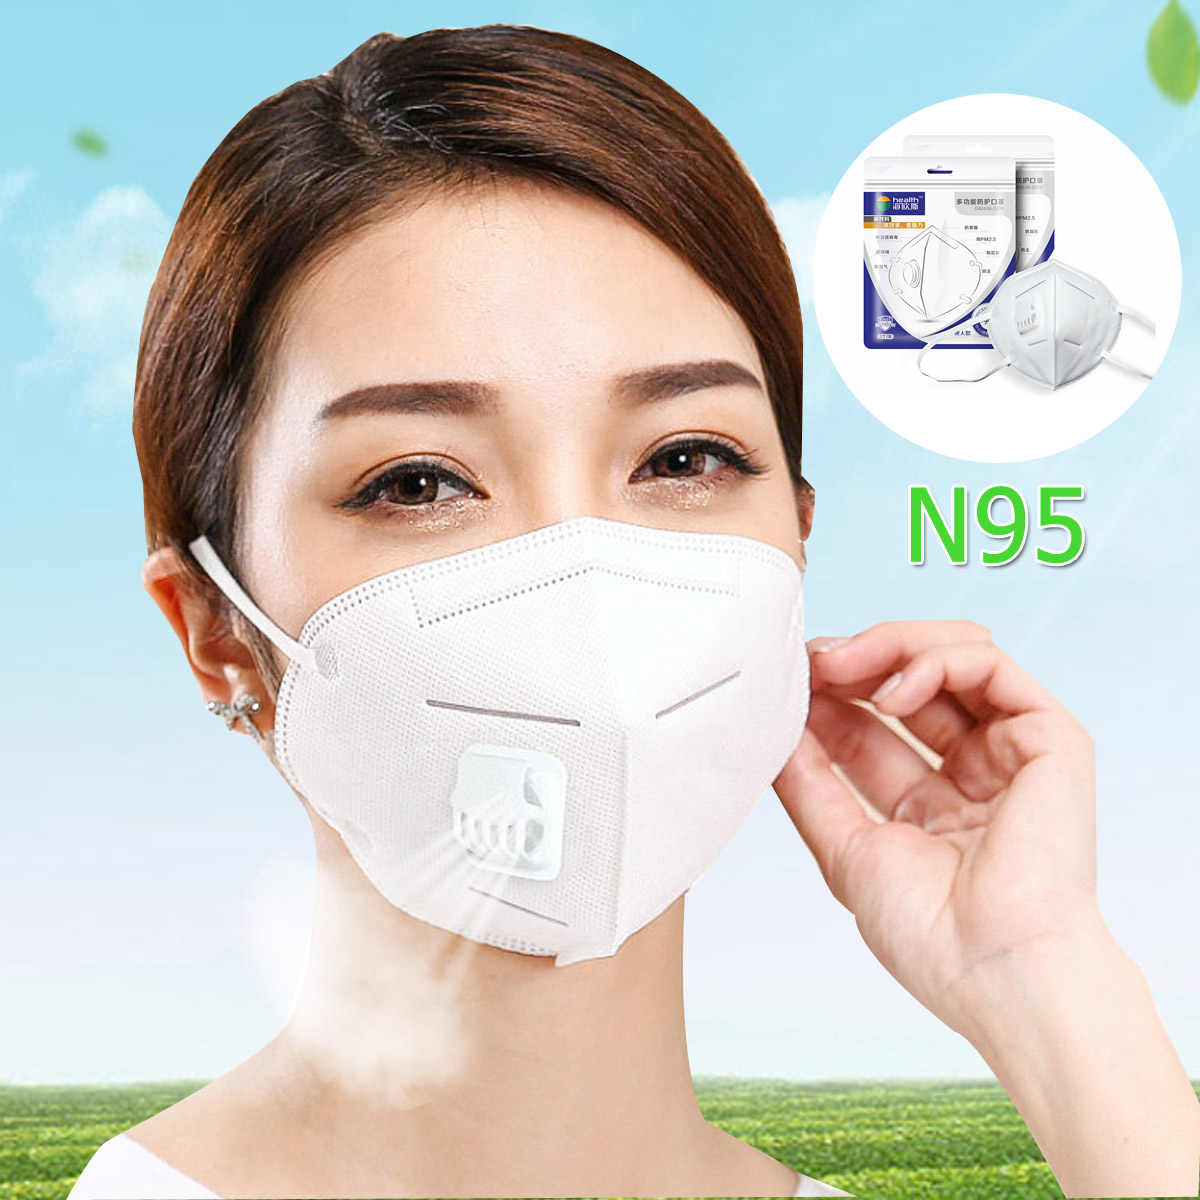 n95 4 layer breathing valve dustproof anti-virus fog pathogen mask